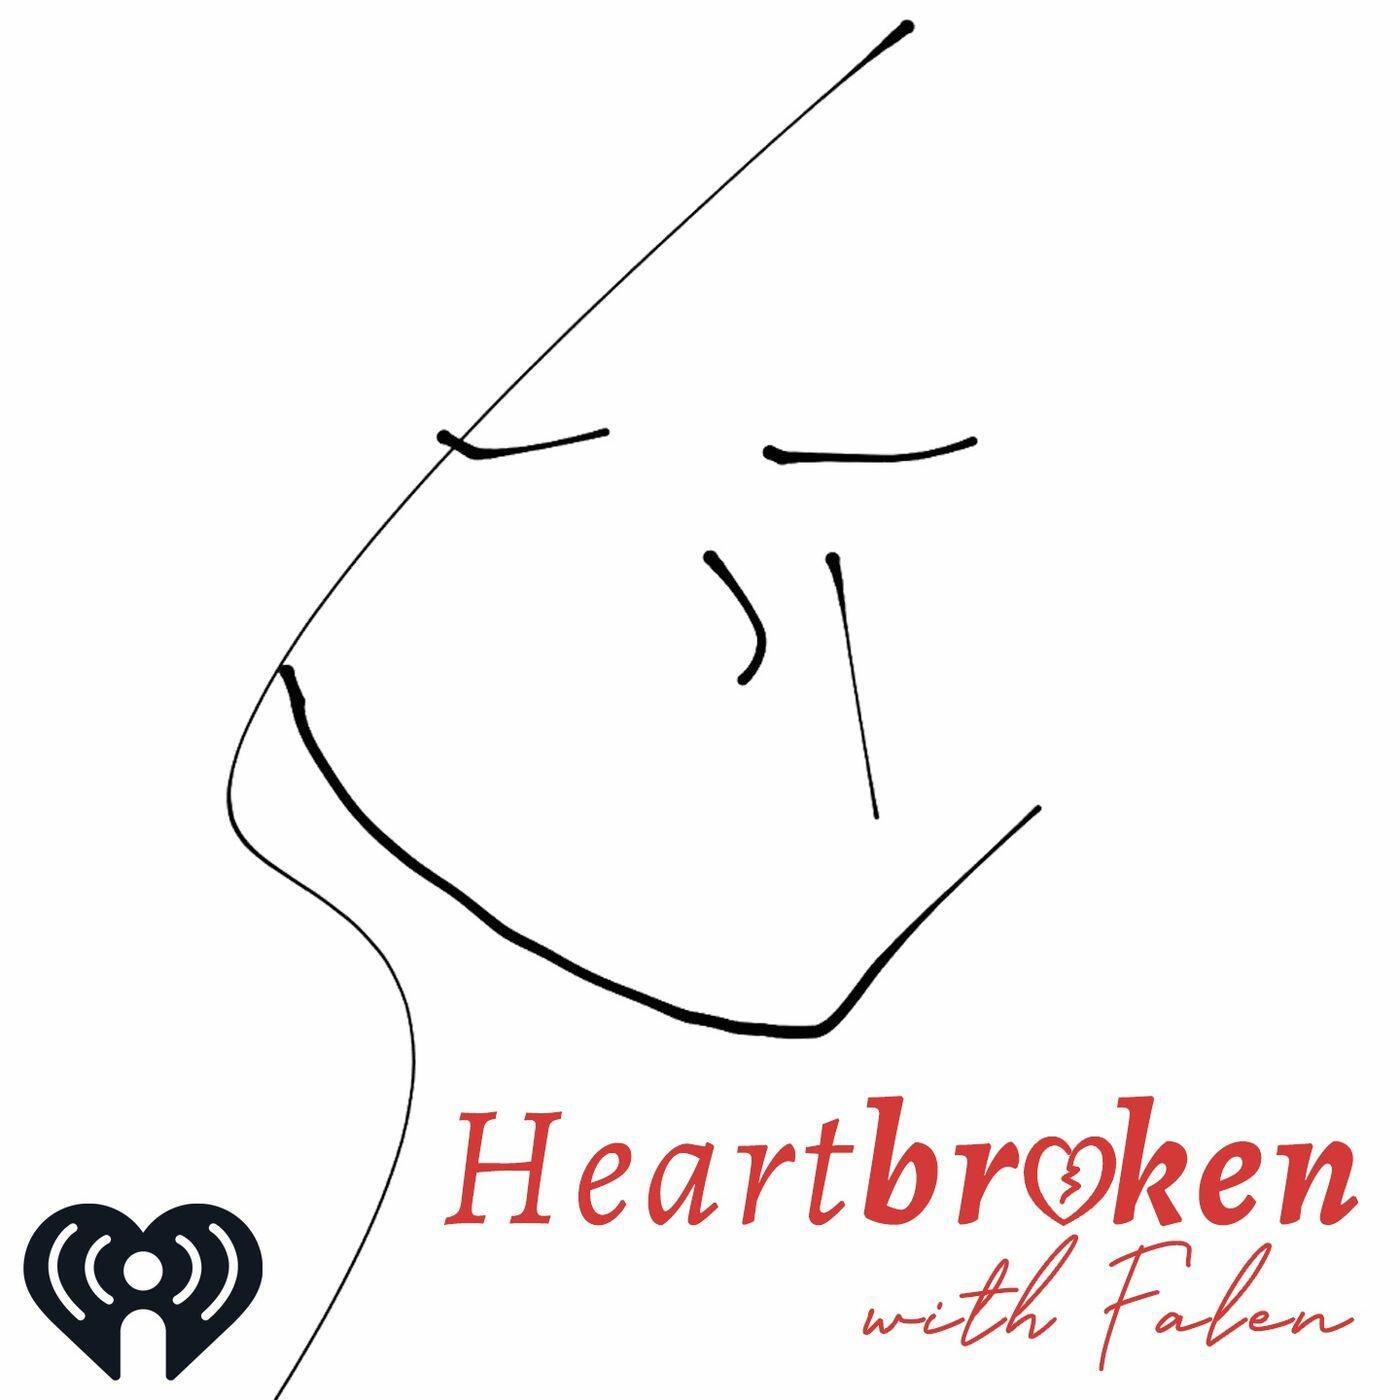 Heartbroken with Falen